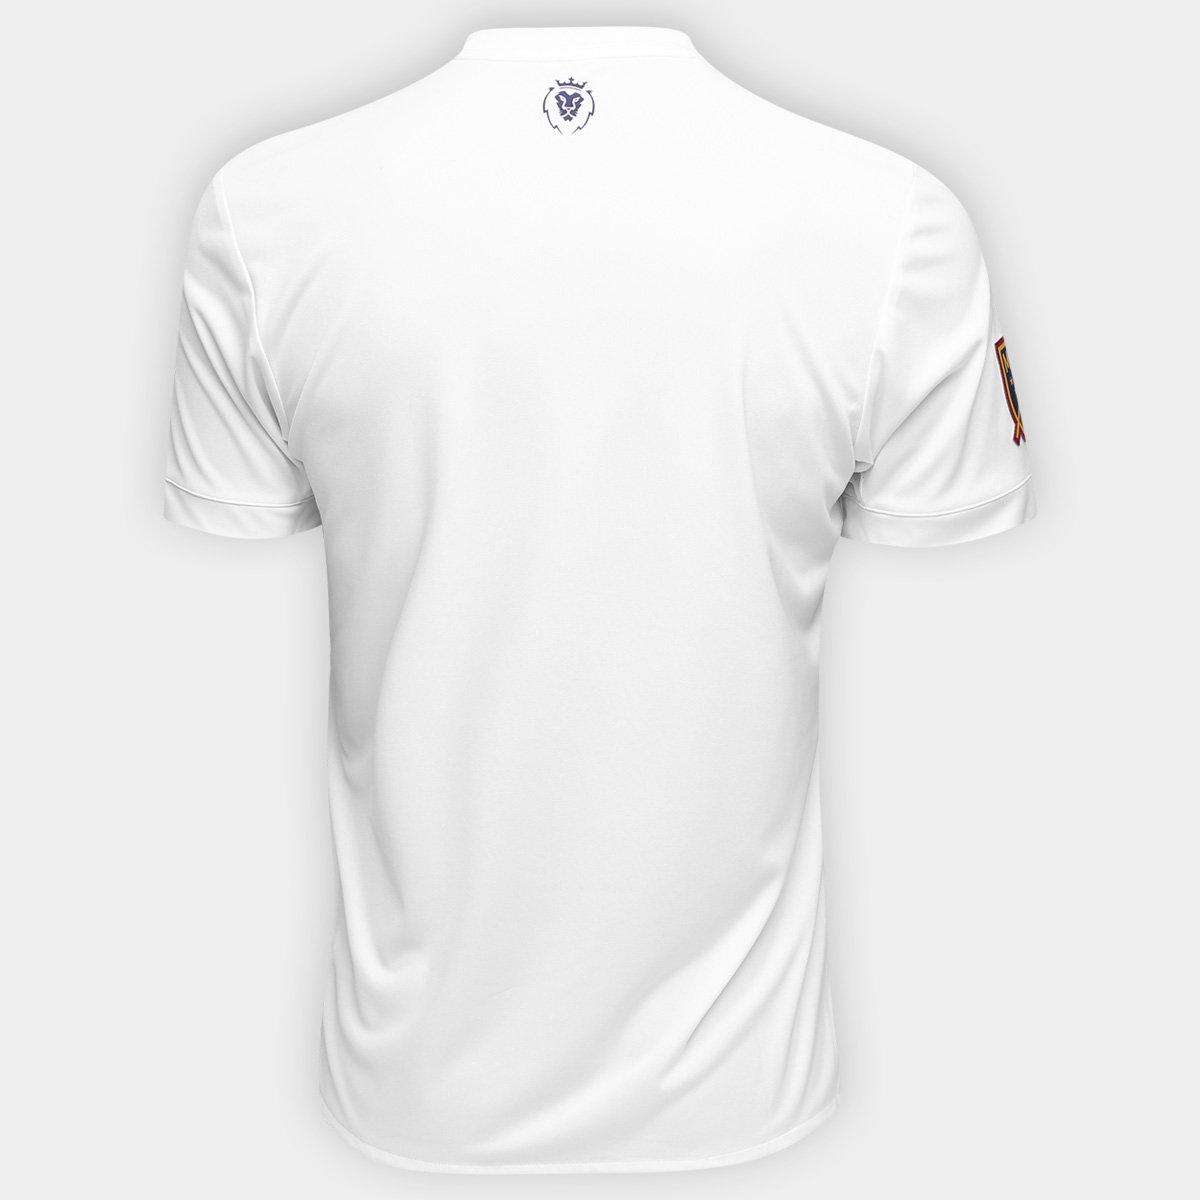 9bb899b822 ... Camisa Real Salt Lake MLS Away 17 18 s nº Torcedor Adidas Masculina ...